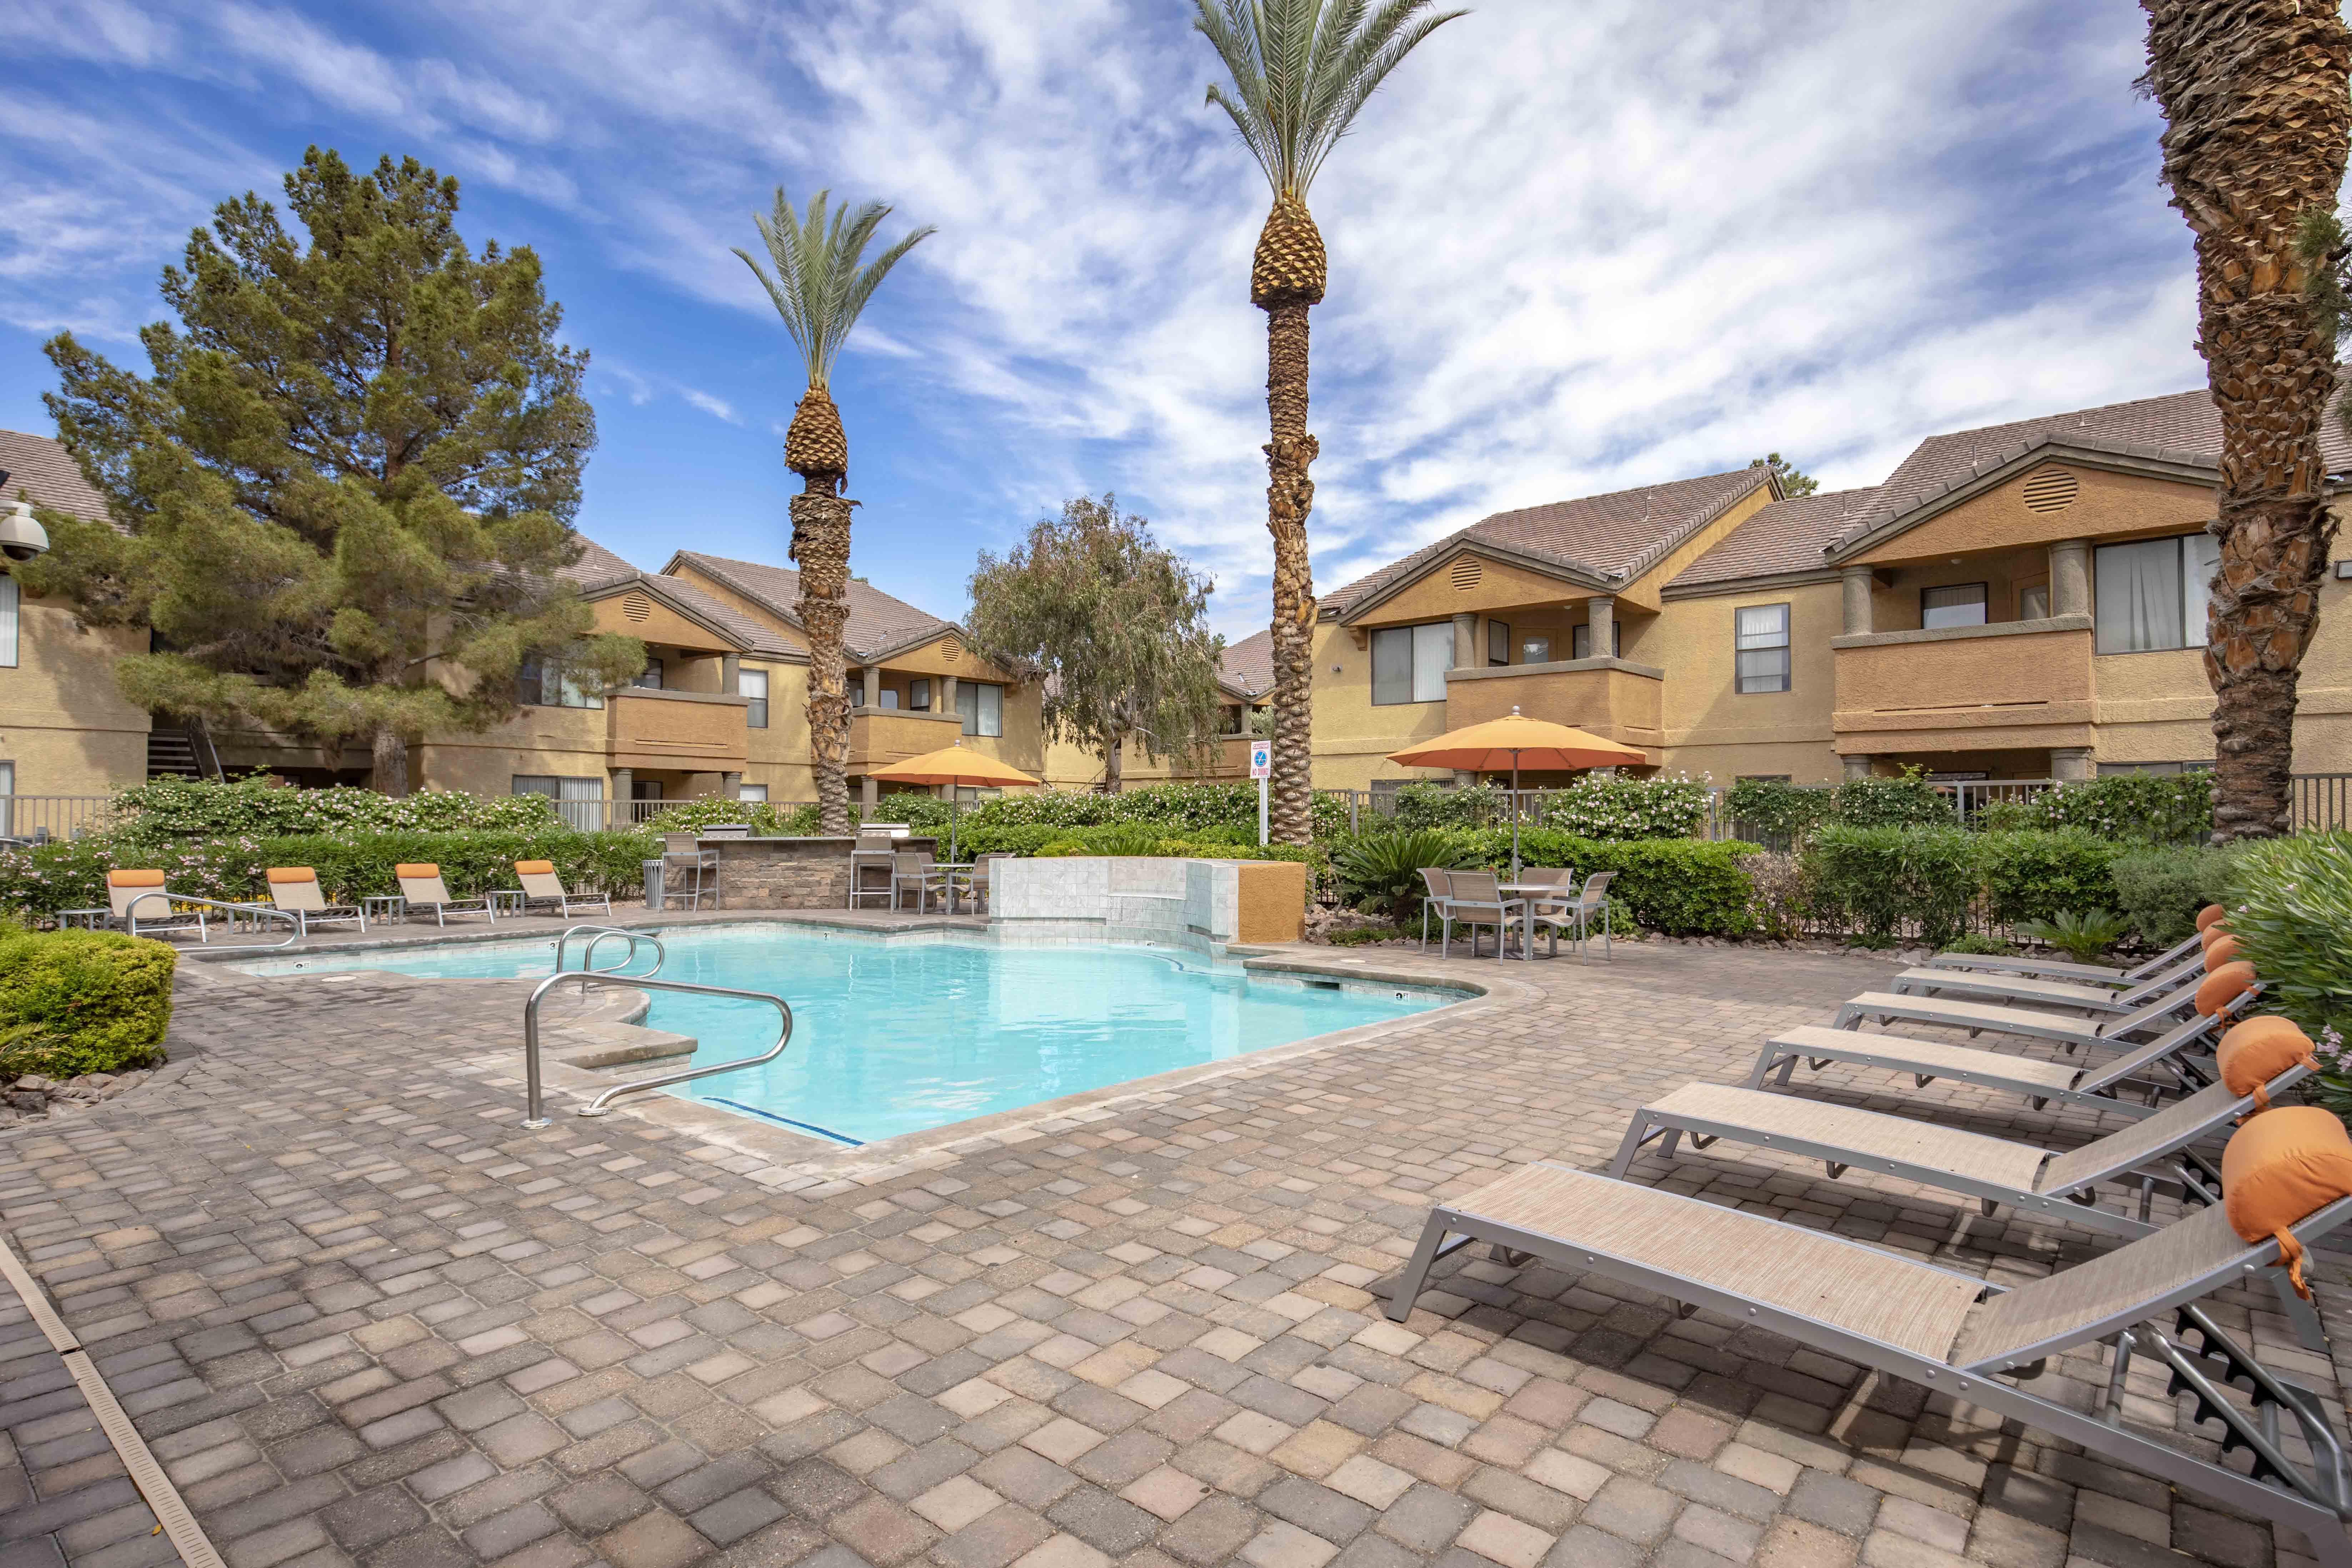 Apartments Near Las Vegas Spectra at 4000 for Las Vegas Students in Las Vegas, NV